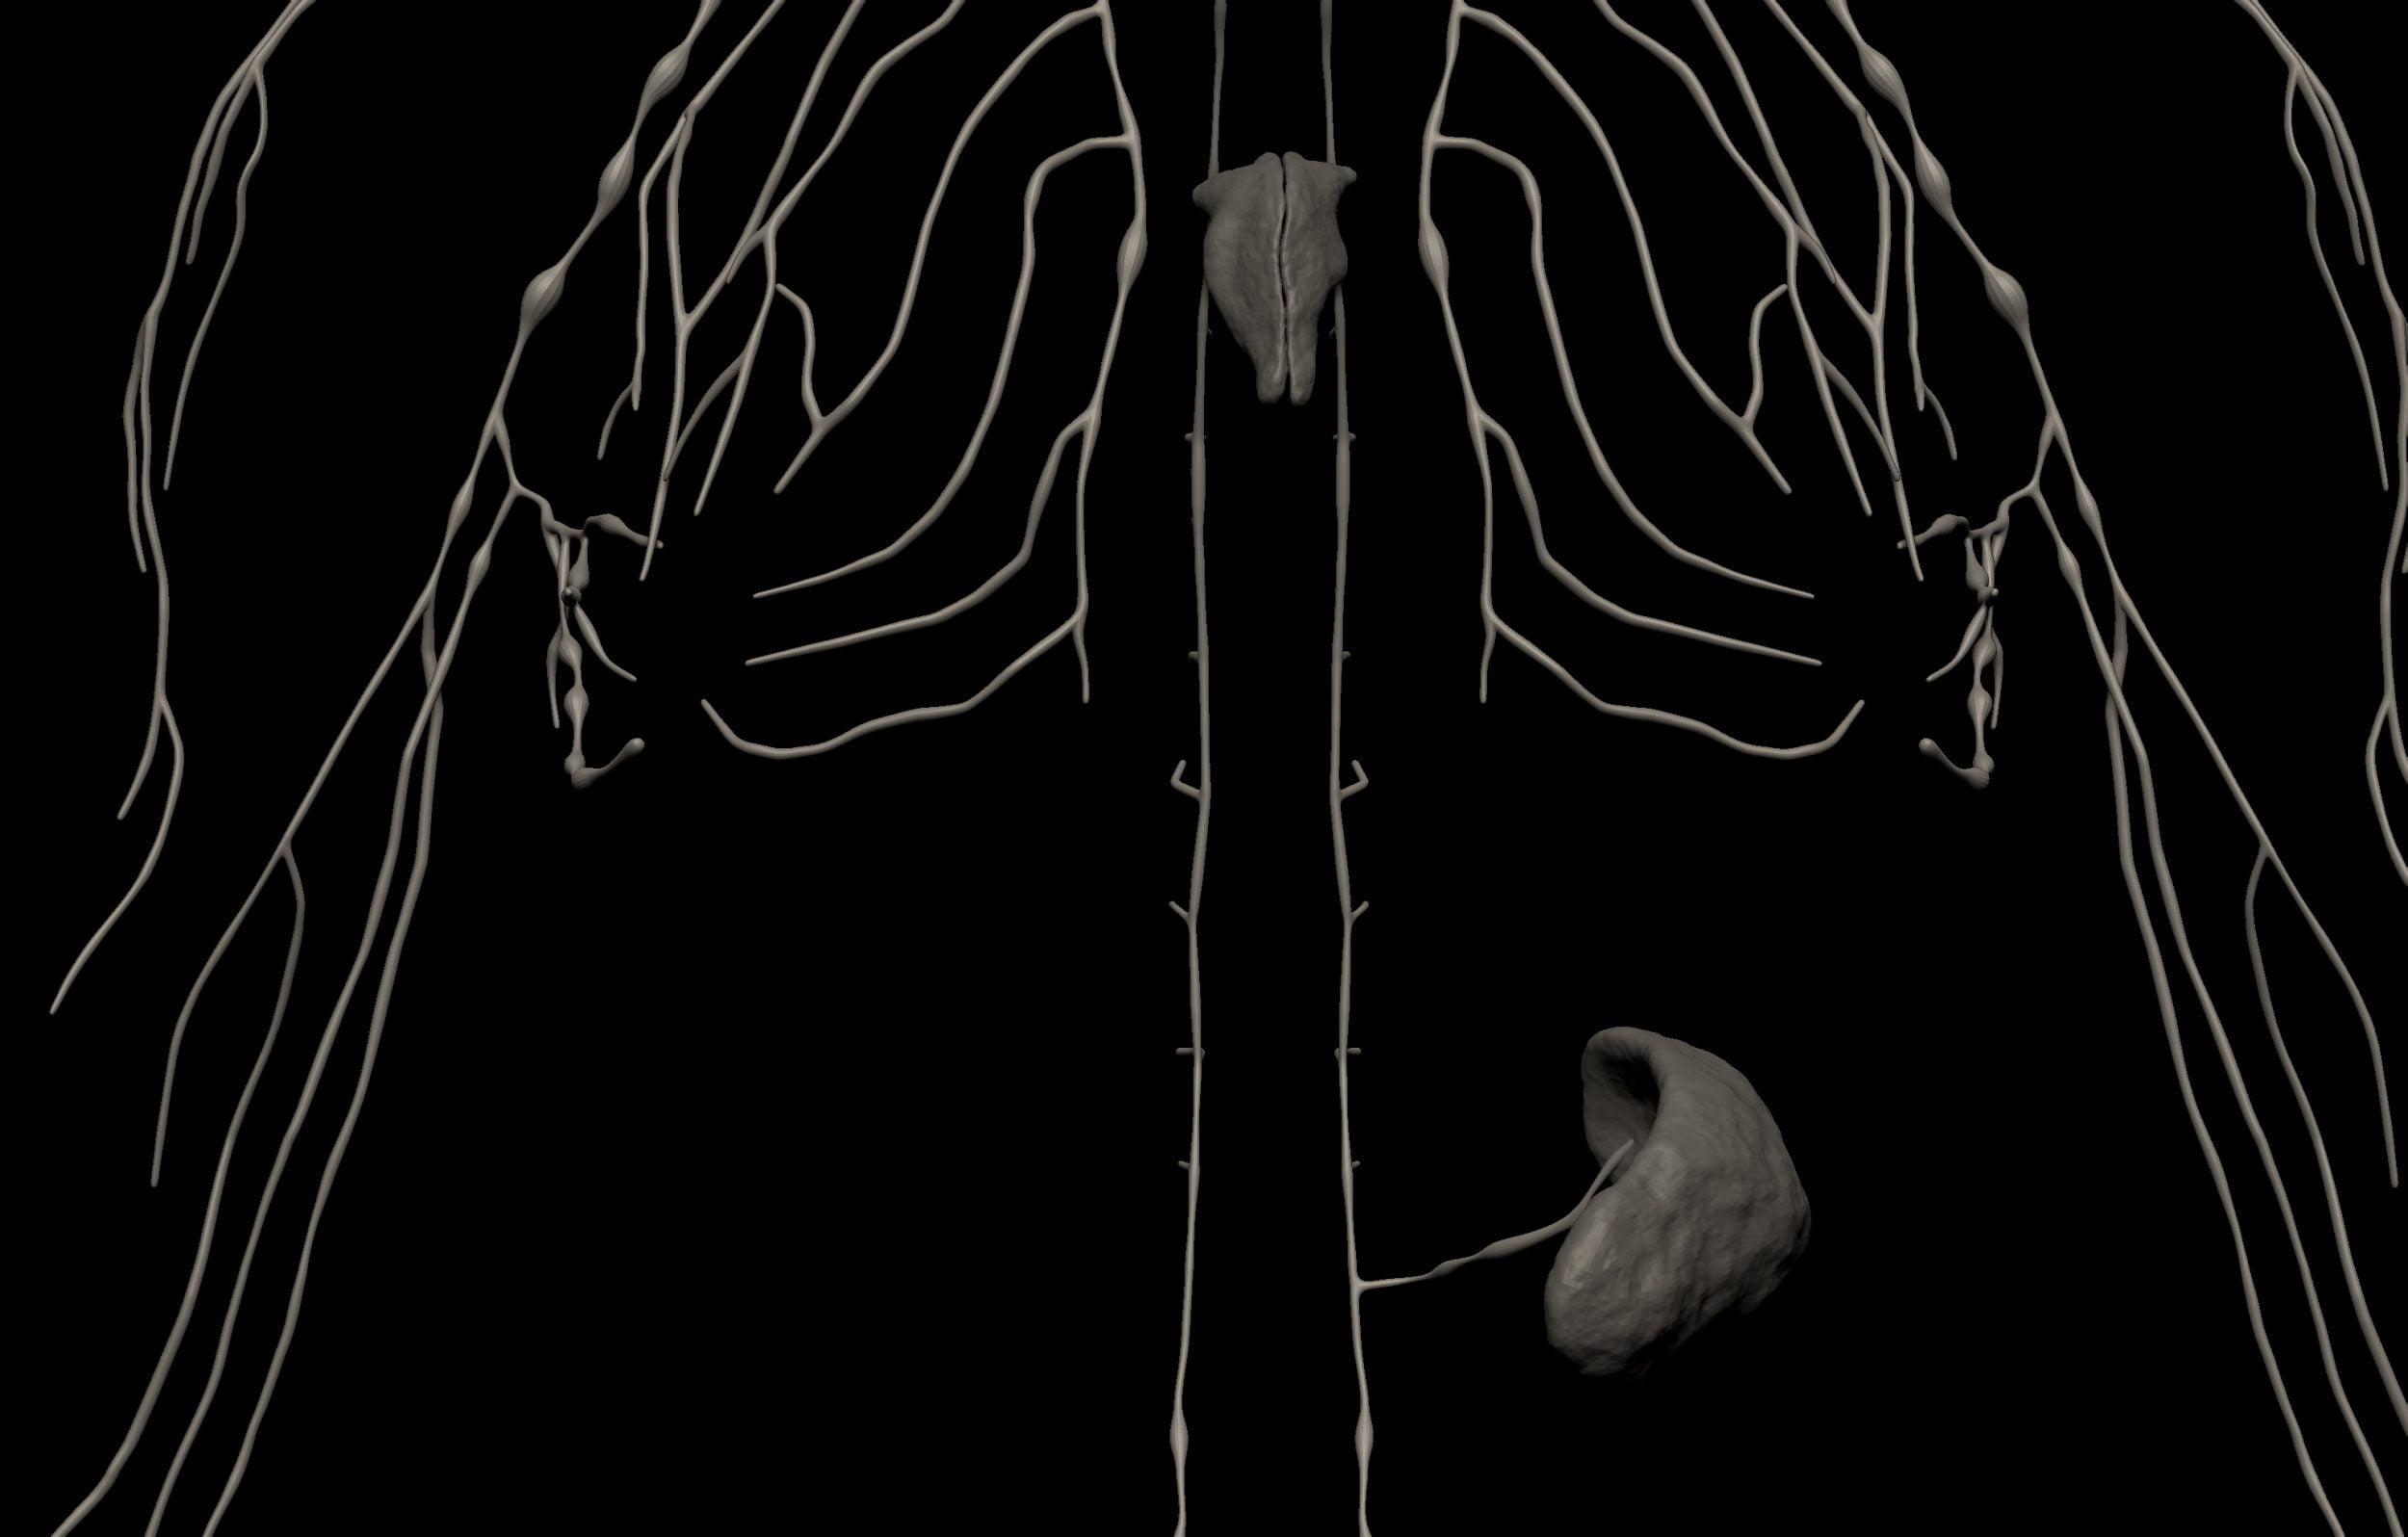 9 scaled SA Anatomy | Study Anatomy in 3D